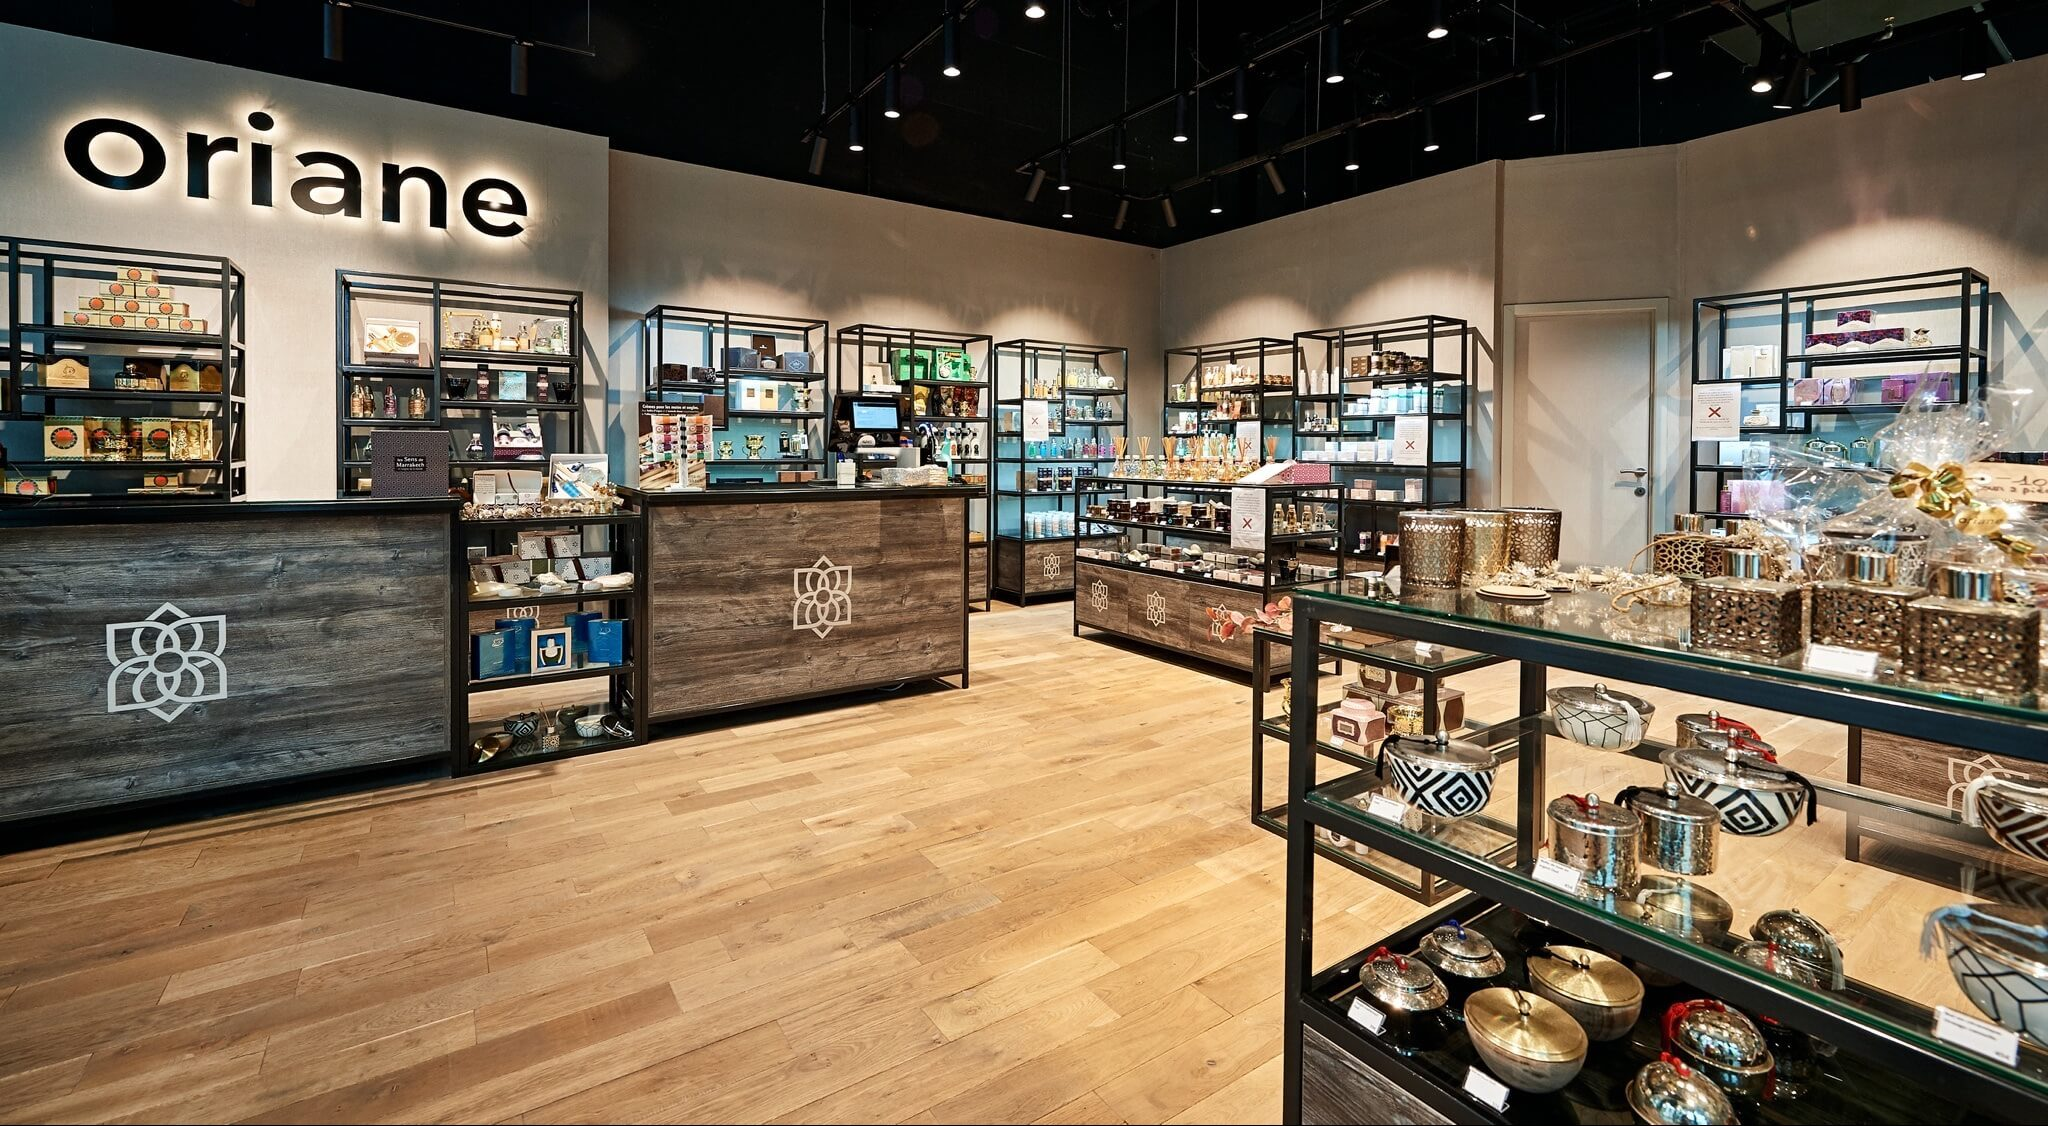 Oriane | Docks Bruxsel | Shopping Center in Brussels